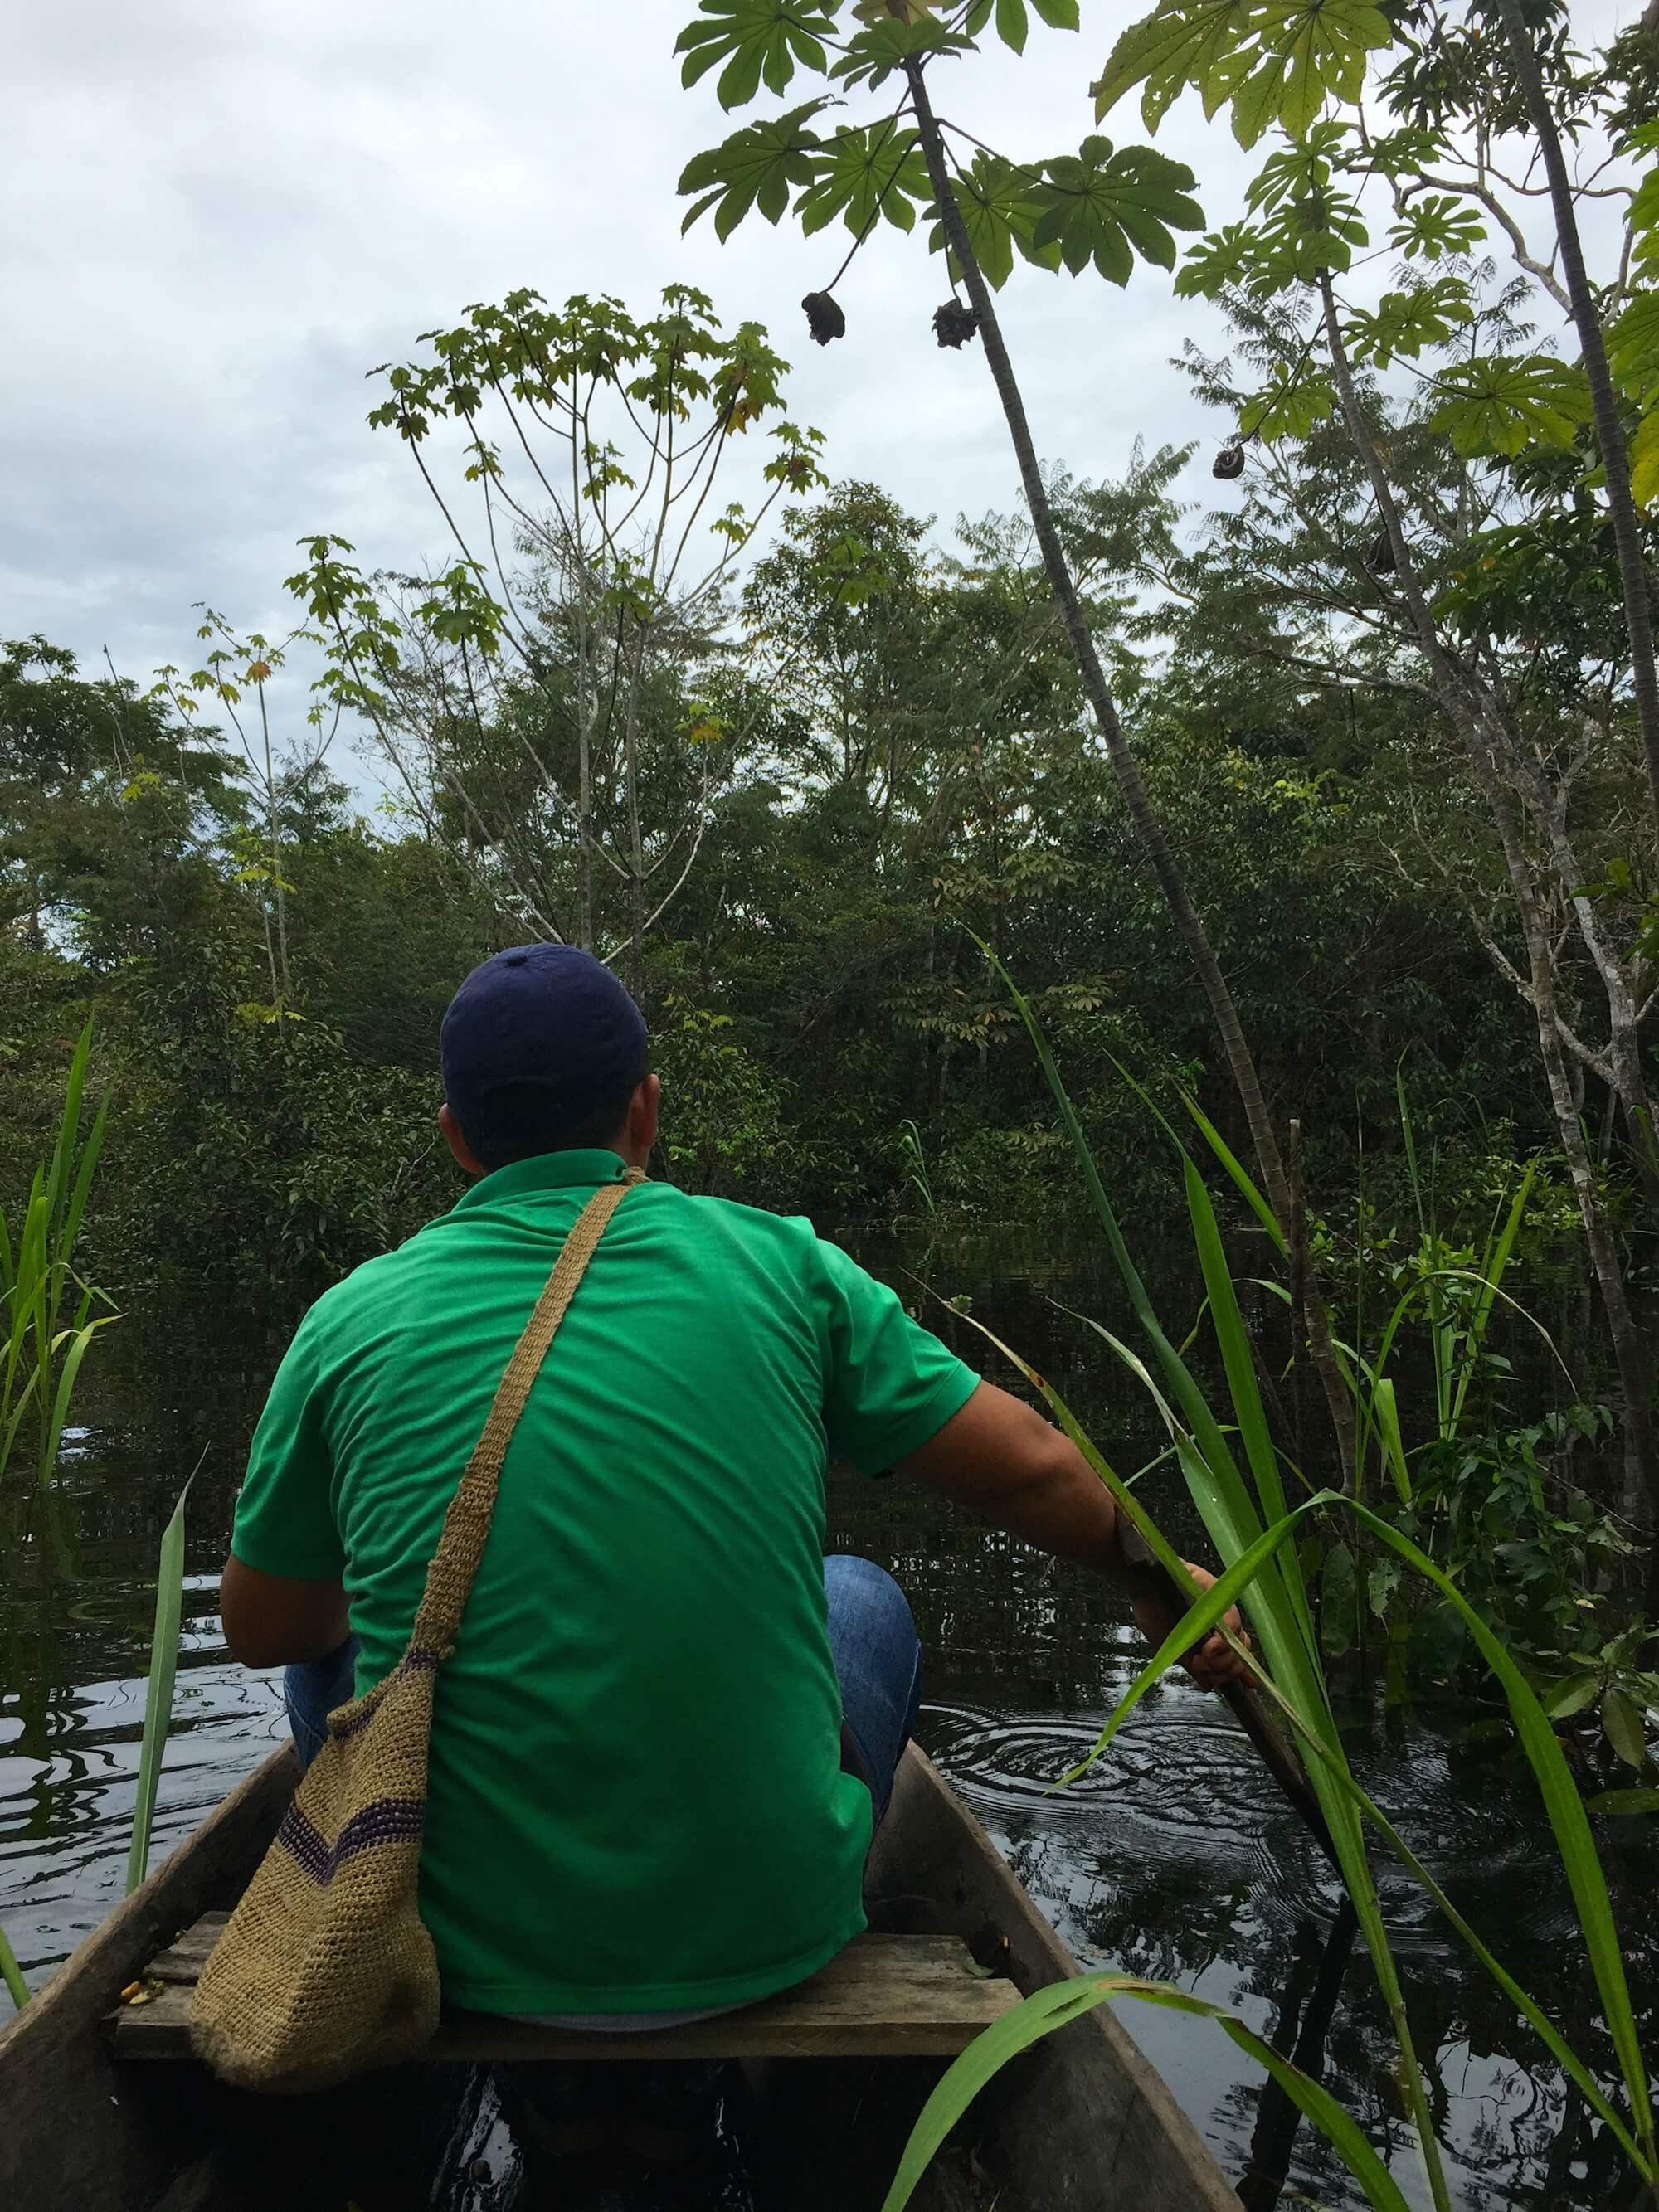 Canoe-Amazon-jungle-river-boat.JPG